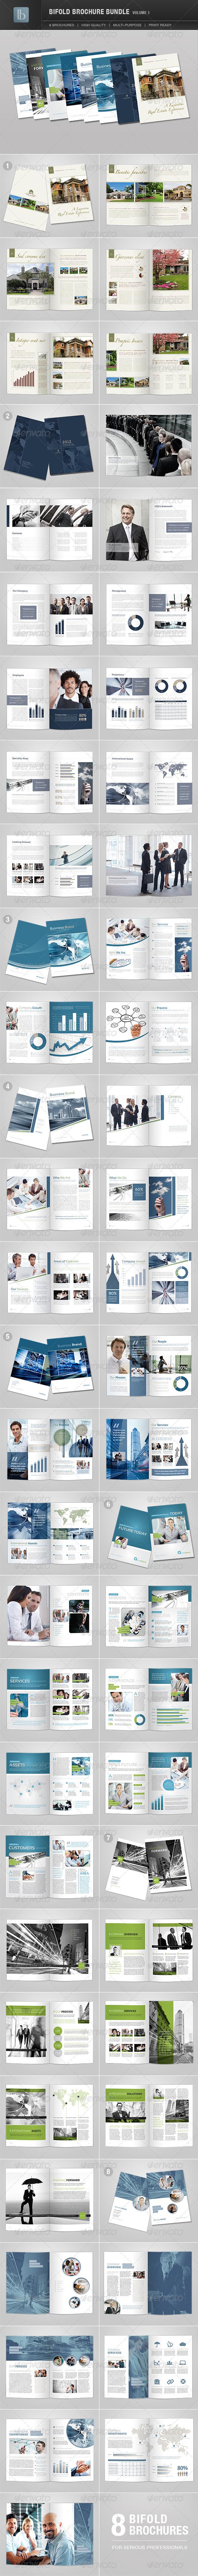 Bifold Brochure Bundle | Volume 1 - Brochures Print Templates